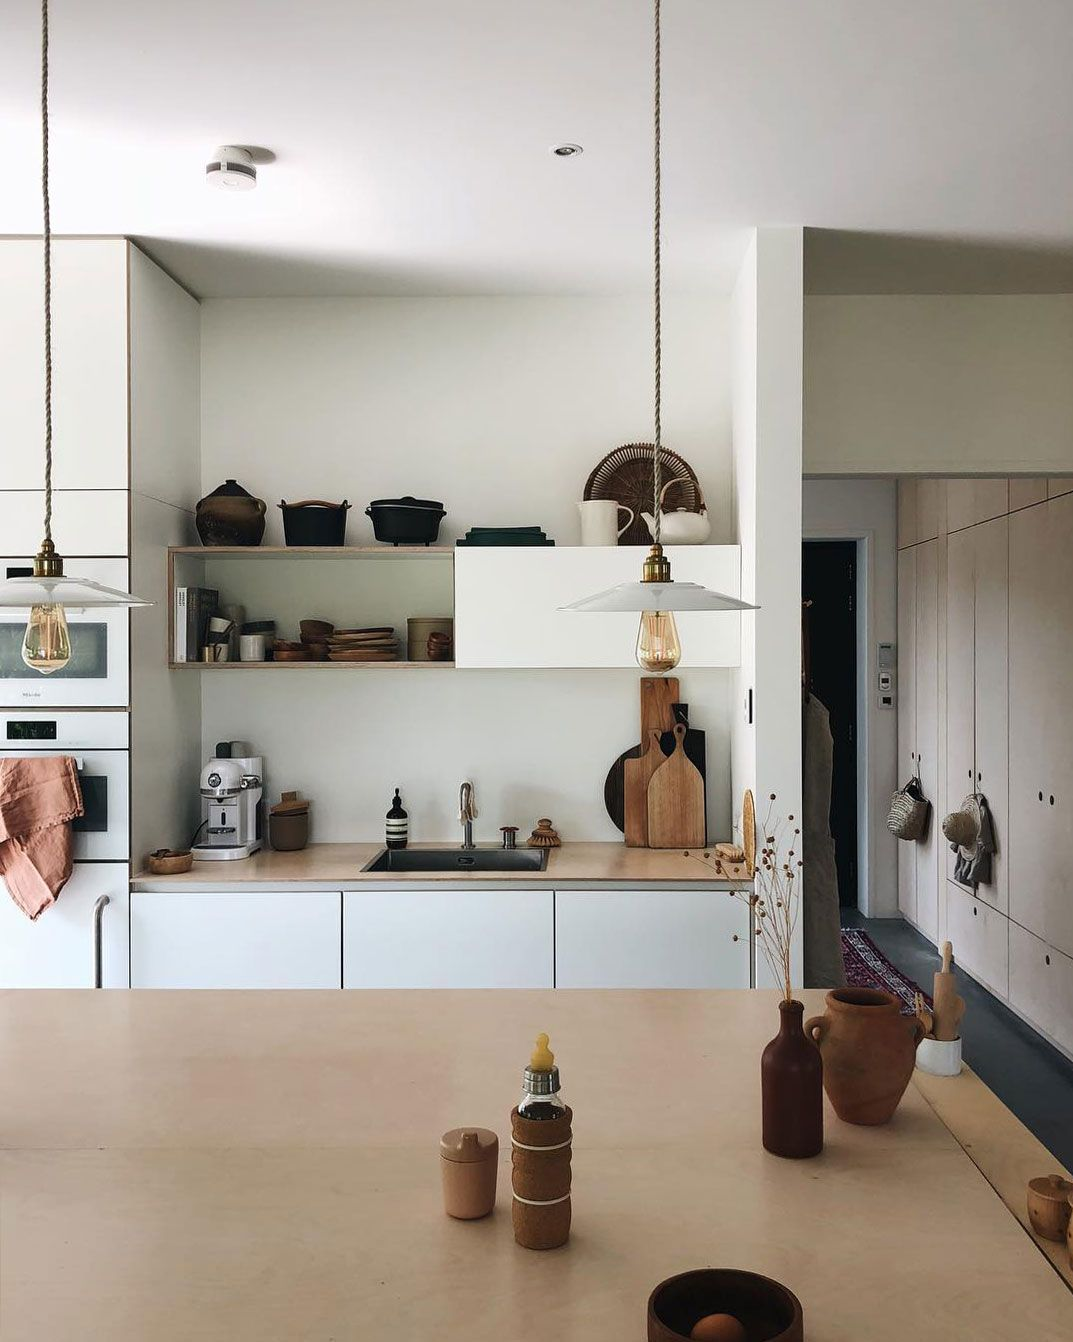 Minimalist Modern Kitchen With Ceramic Goods Sfgirlbybay Minimalist Modern Kitchens Scandinavian Home My Scandinavian Home